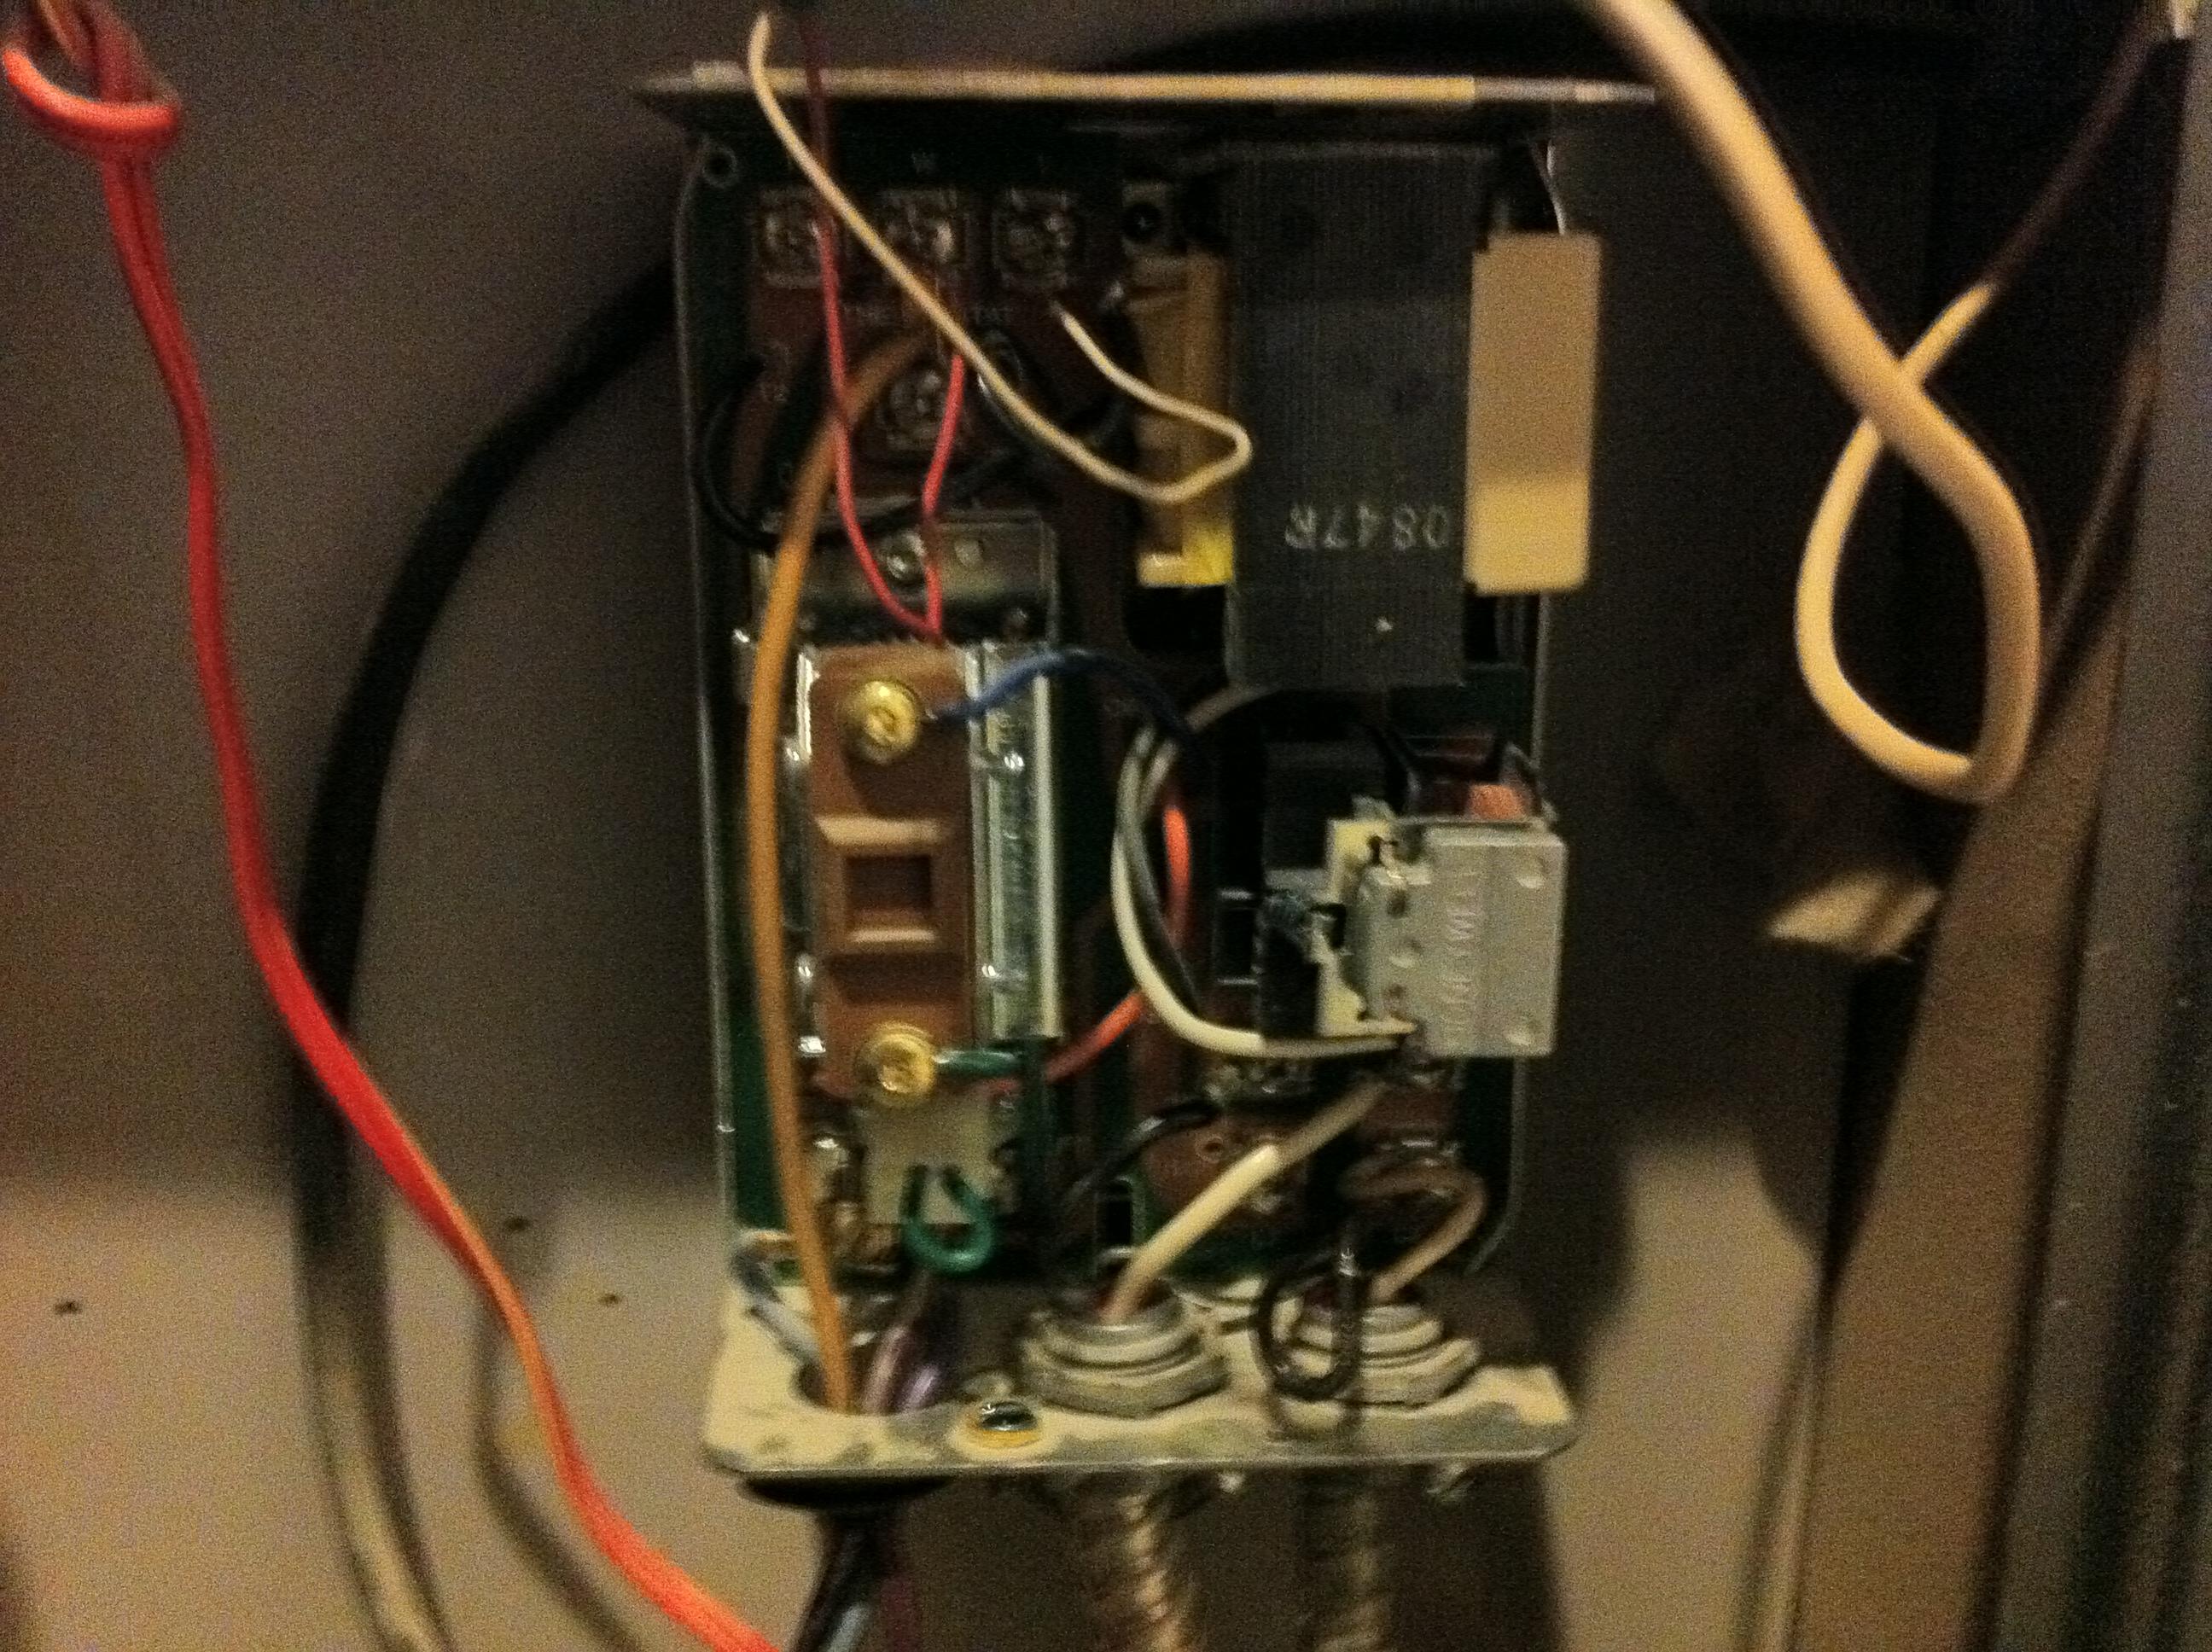 honeywell aquastat l4006 wiring diagram mazda color codes circulator issues  heating help the wall